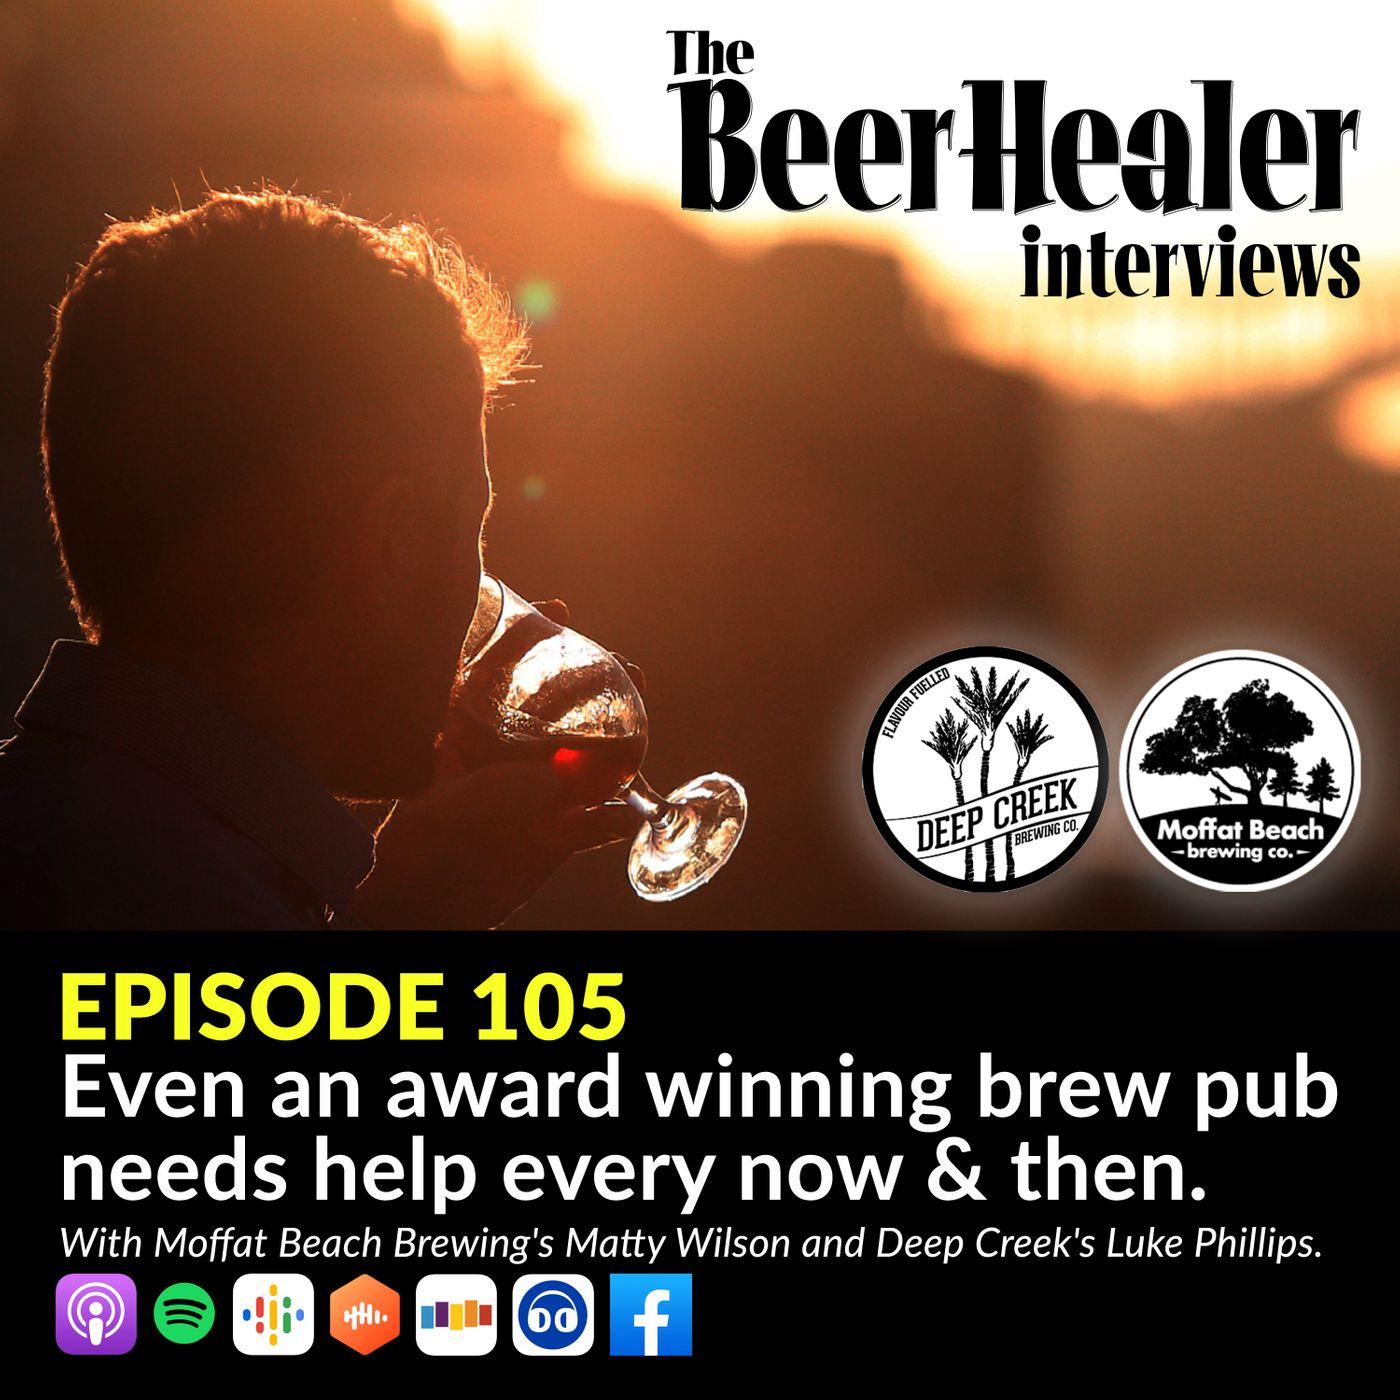 Ep. 105 - Even an award winning brew pub needs help every now & then. With Moffat Beach Brewing's Matty Wilson and Deep Creek's Luke Phillips.